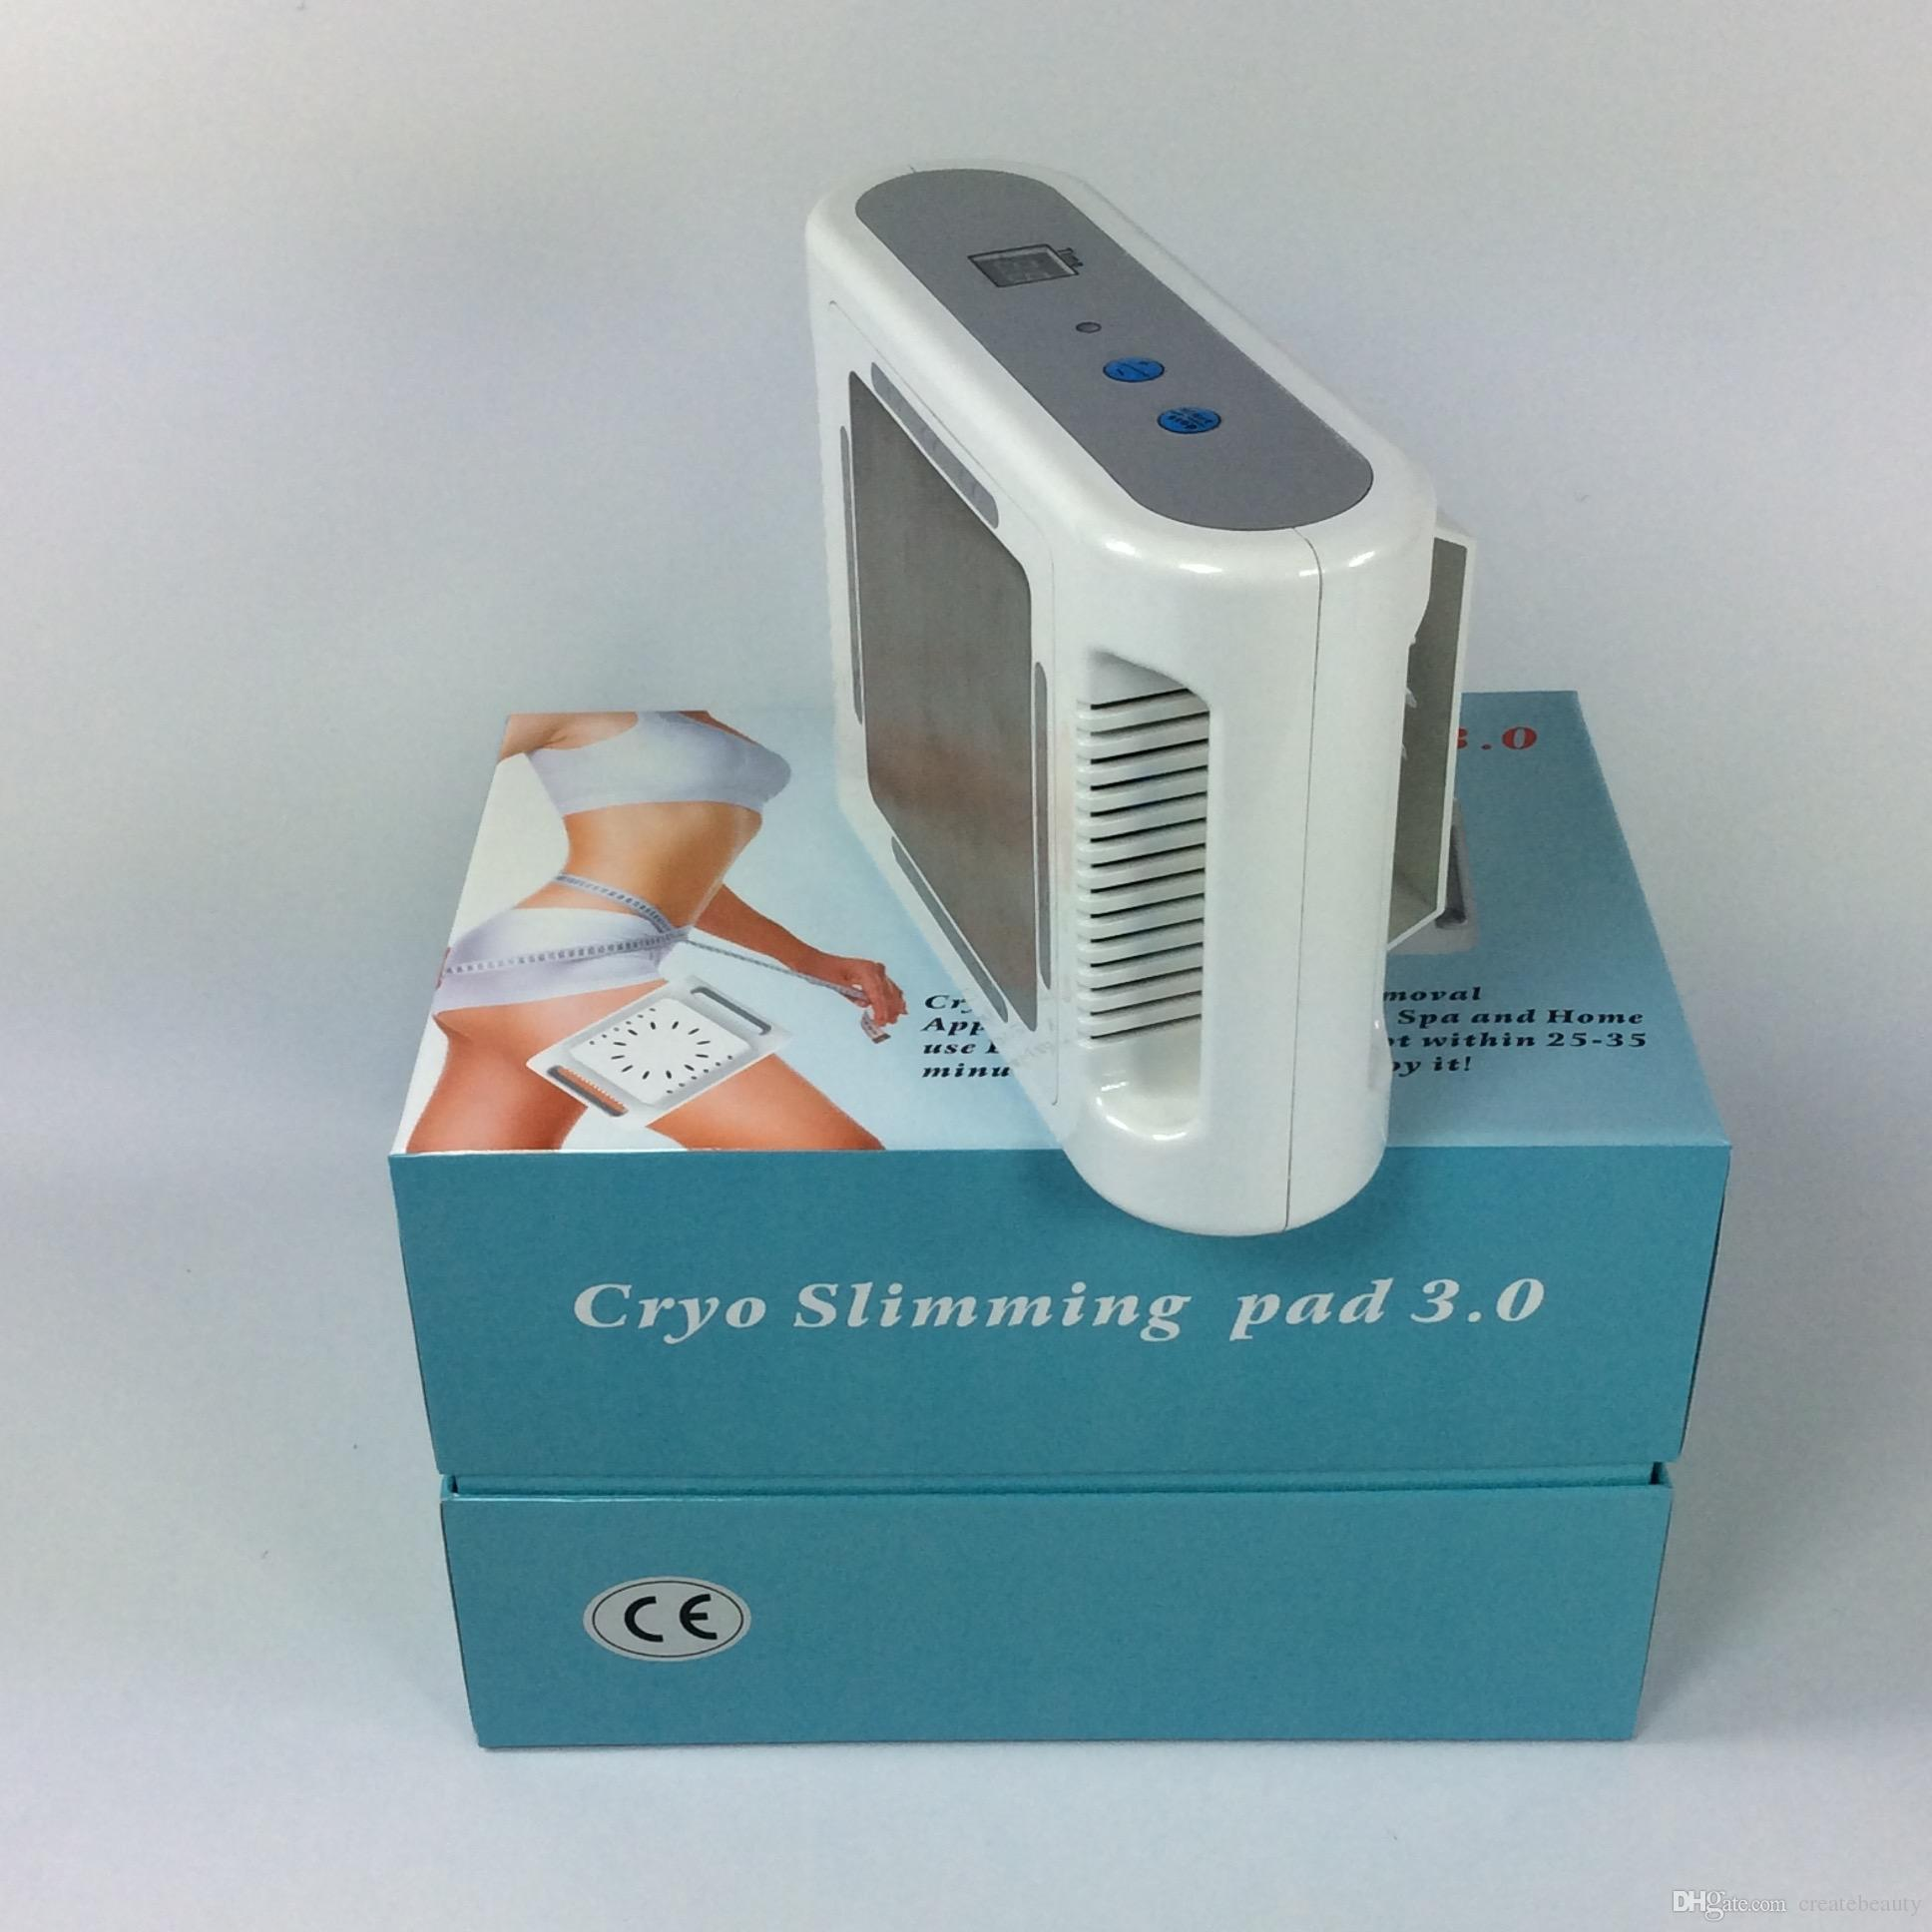 zeltiq coolsculpting machine